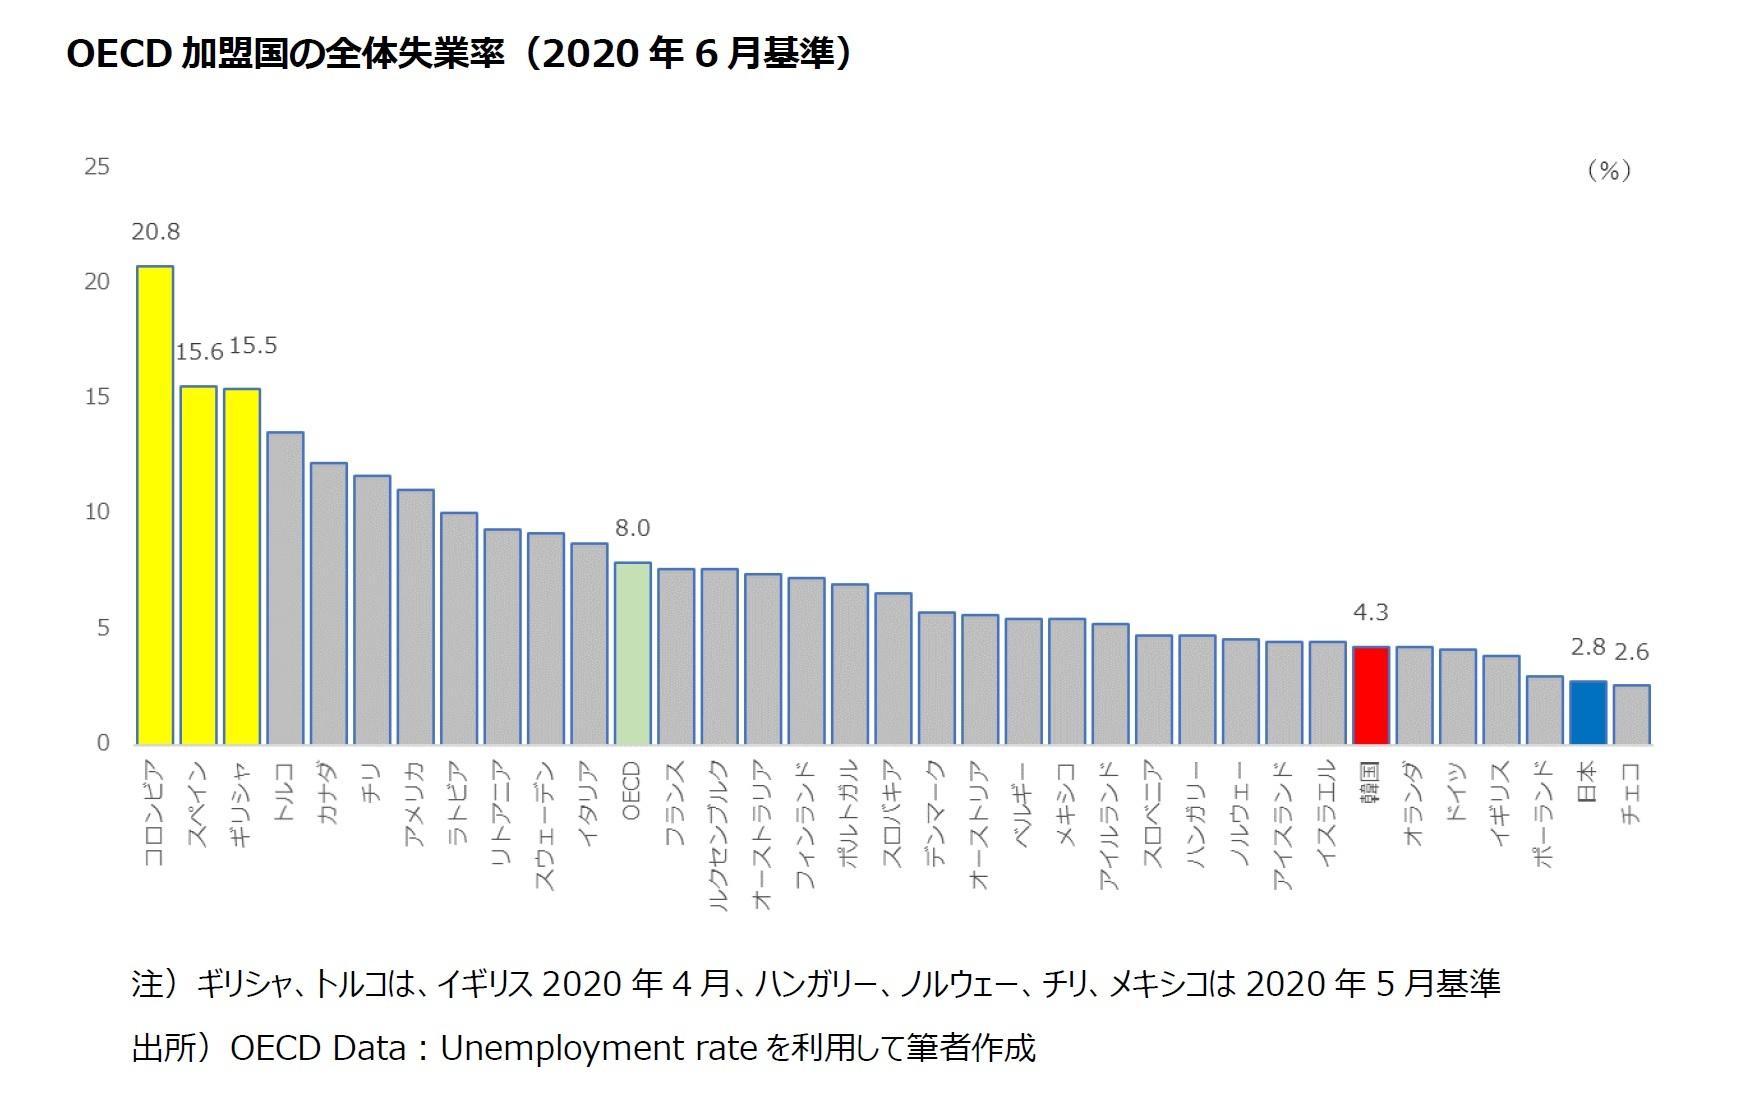 OECD 加盟国の全体失業率(2020 年6 月基準)